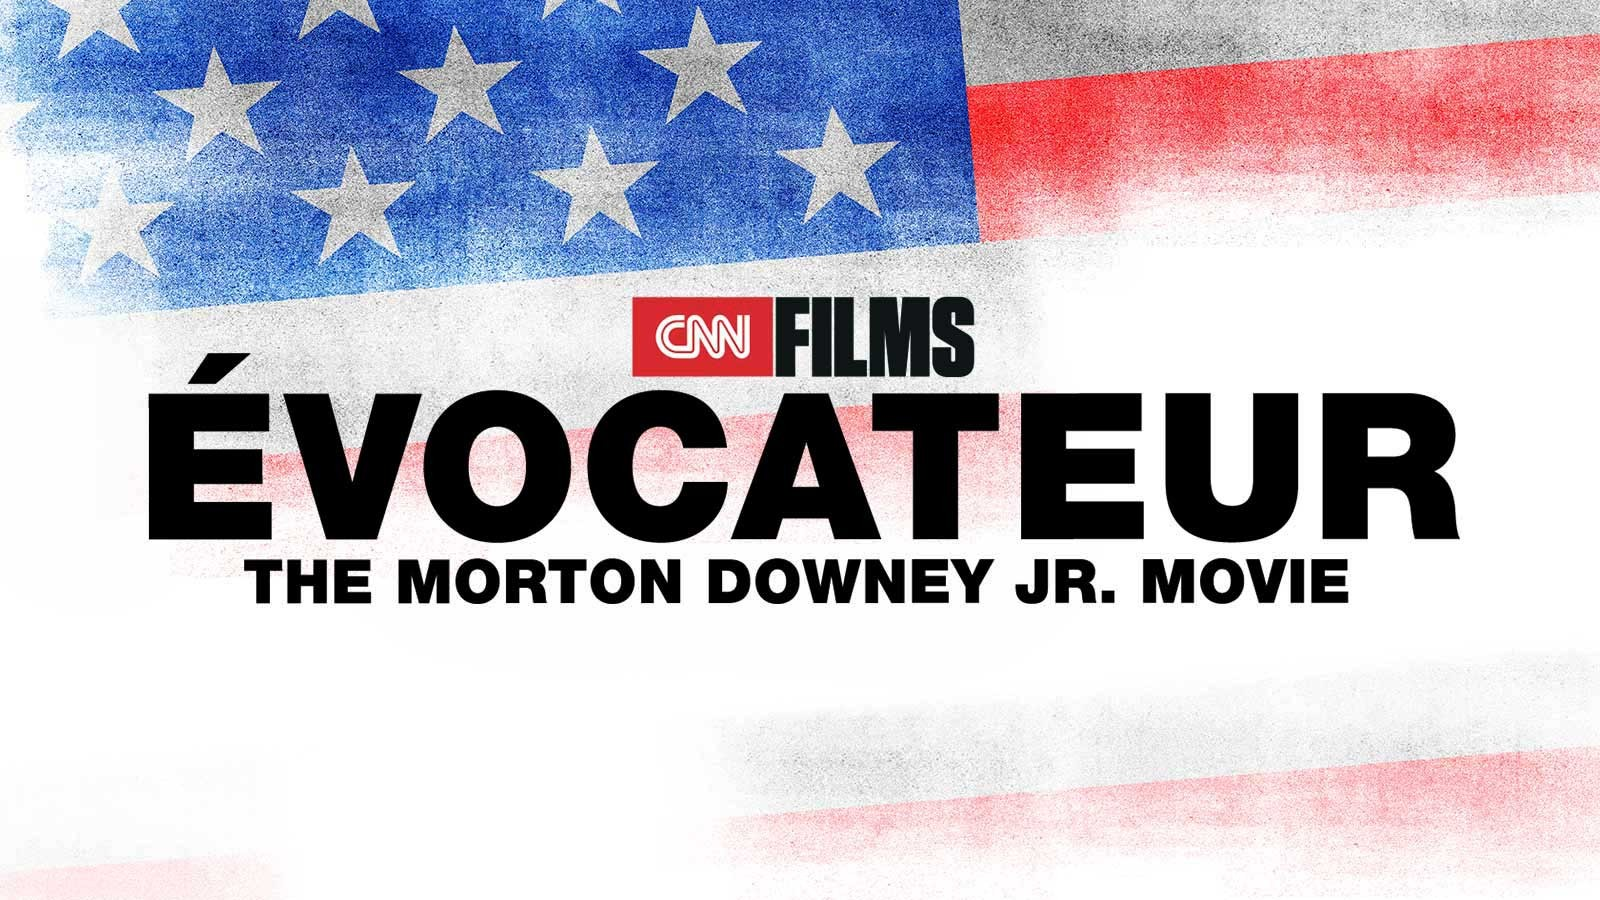 Évocateur: The Morton Downey Jr. Movie (2012) - IMDb